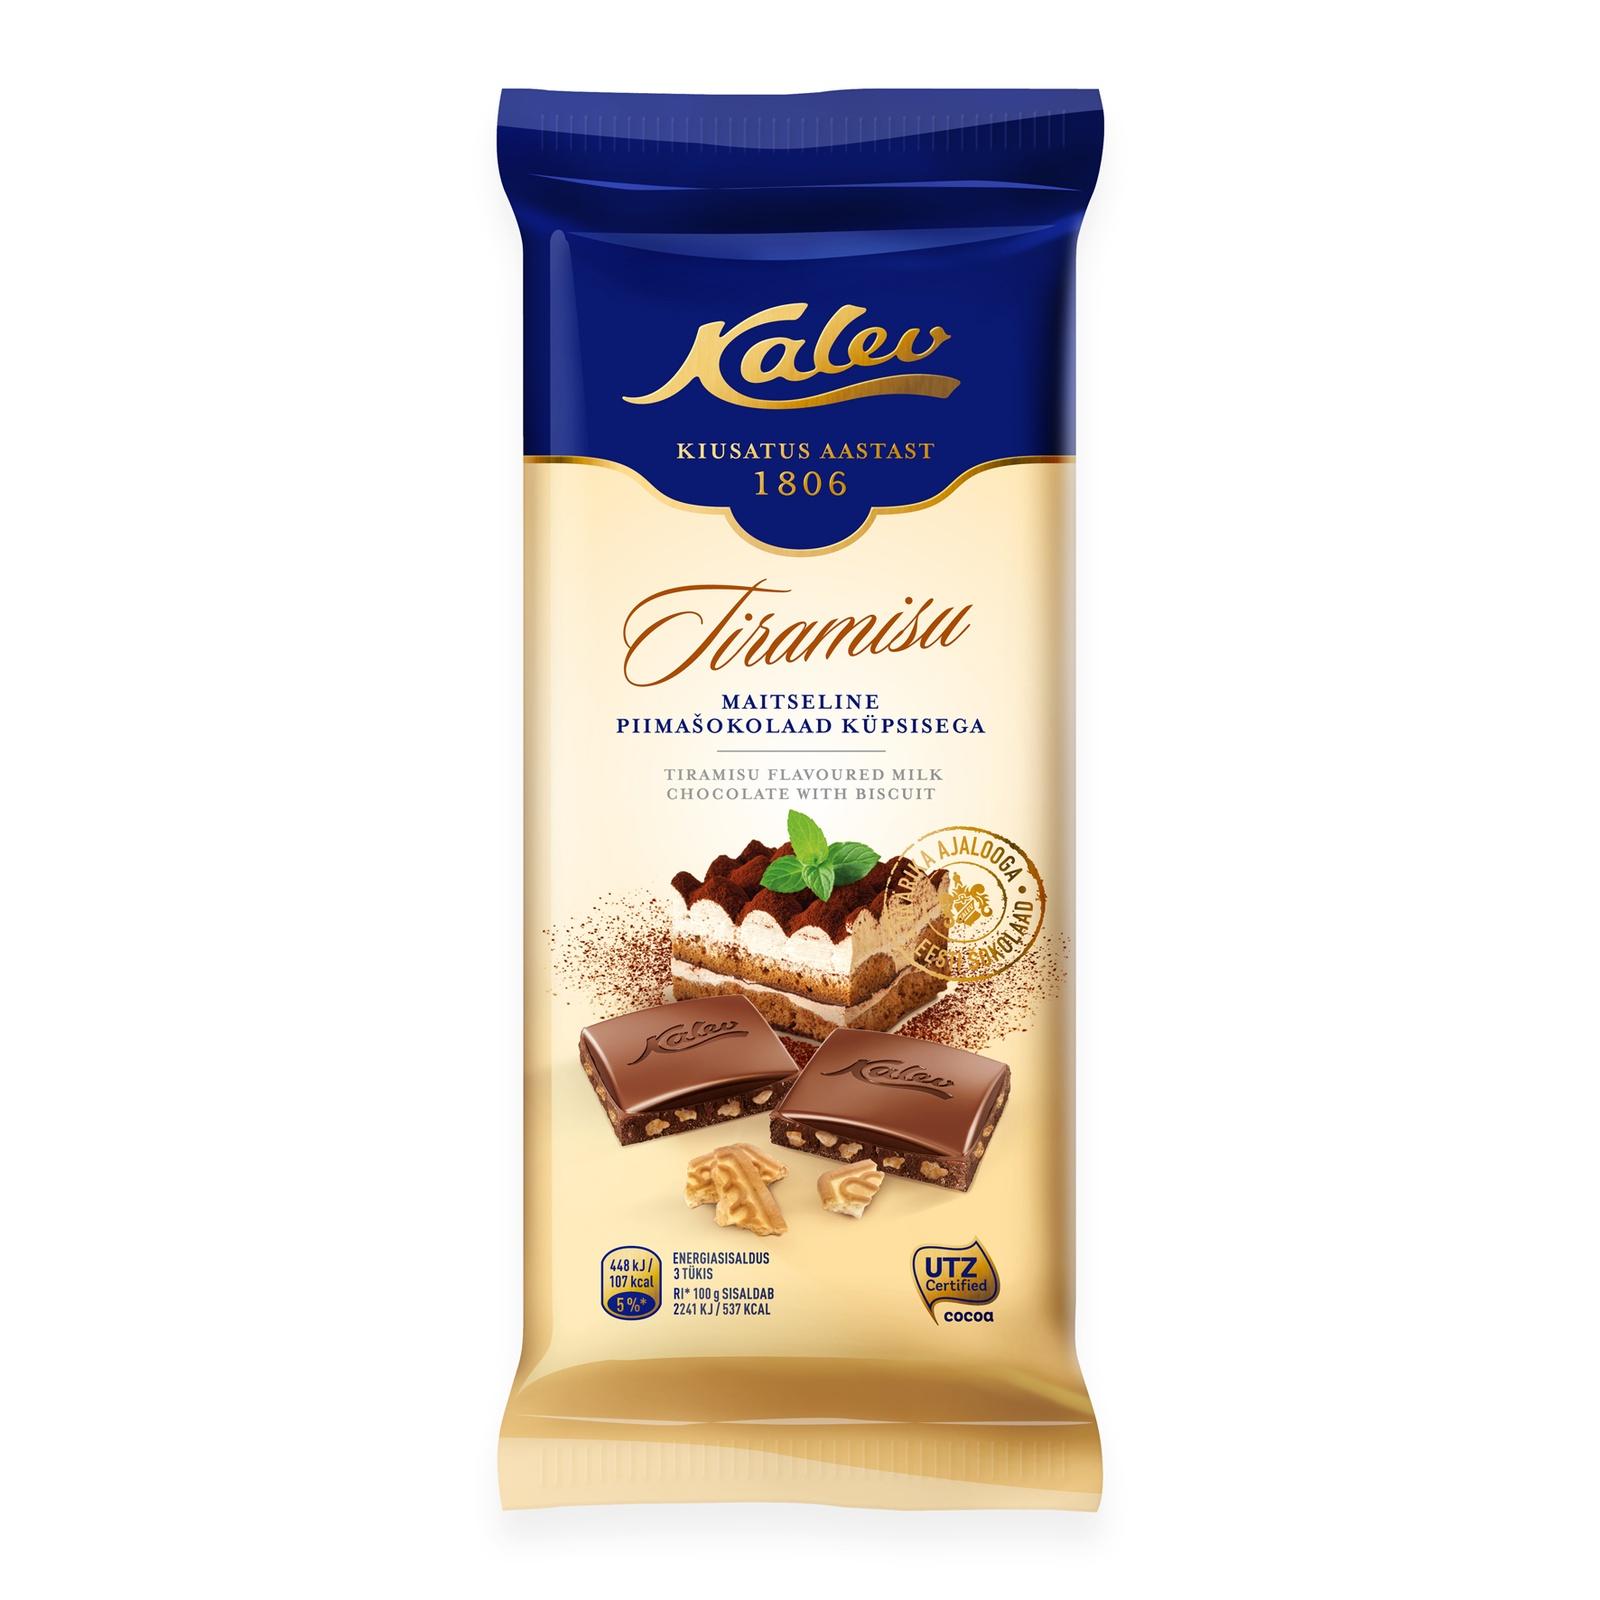 Шоколад KALEV 4704, 100